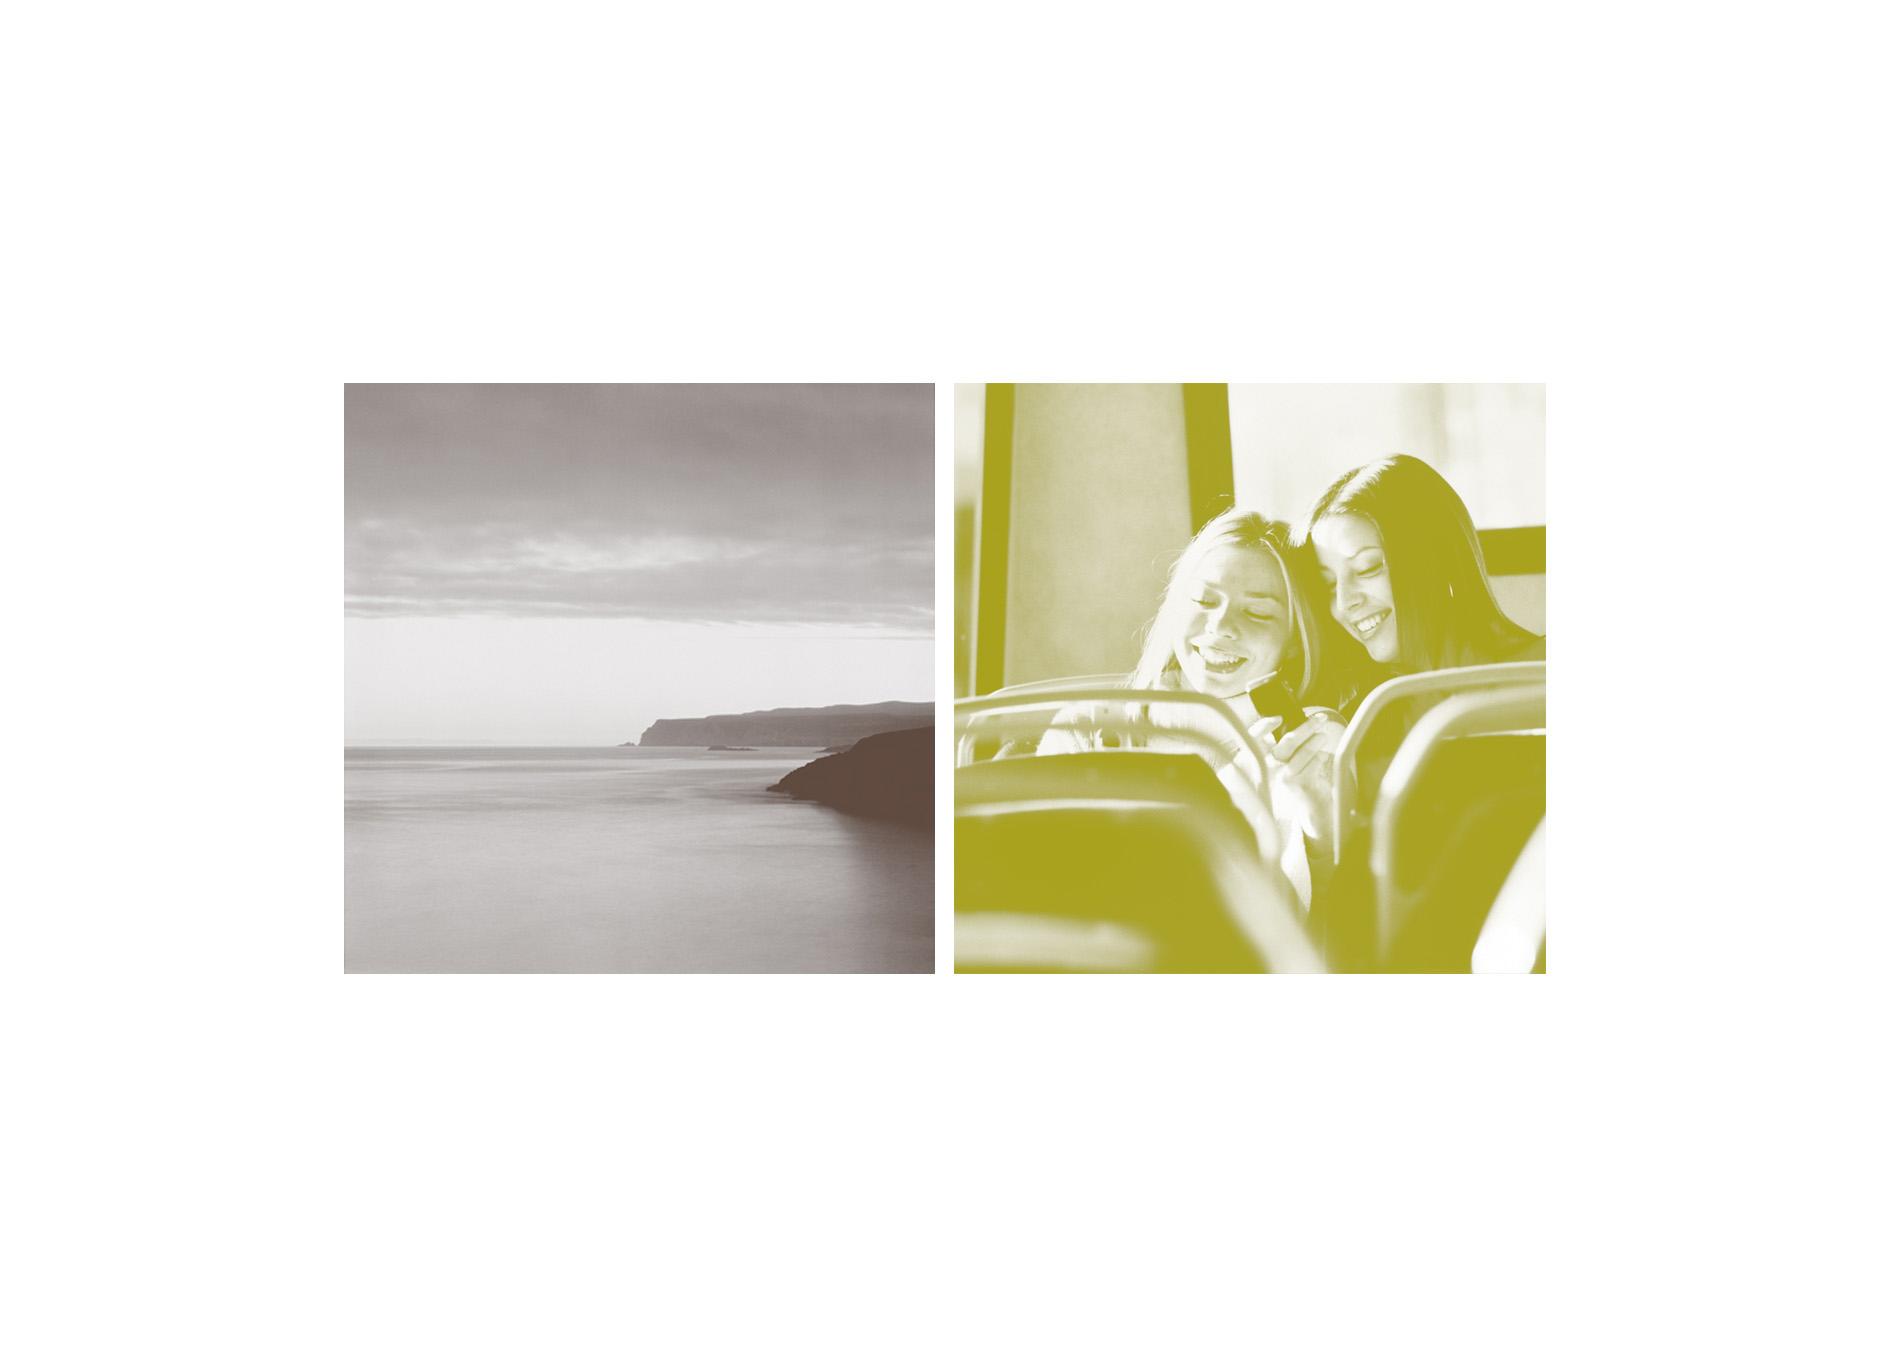 isphotographs